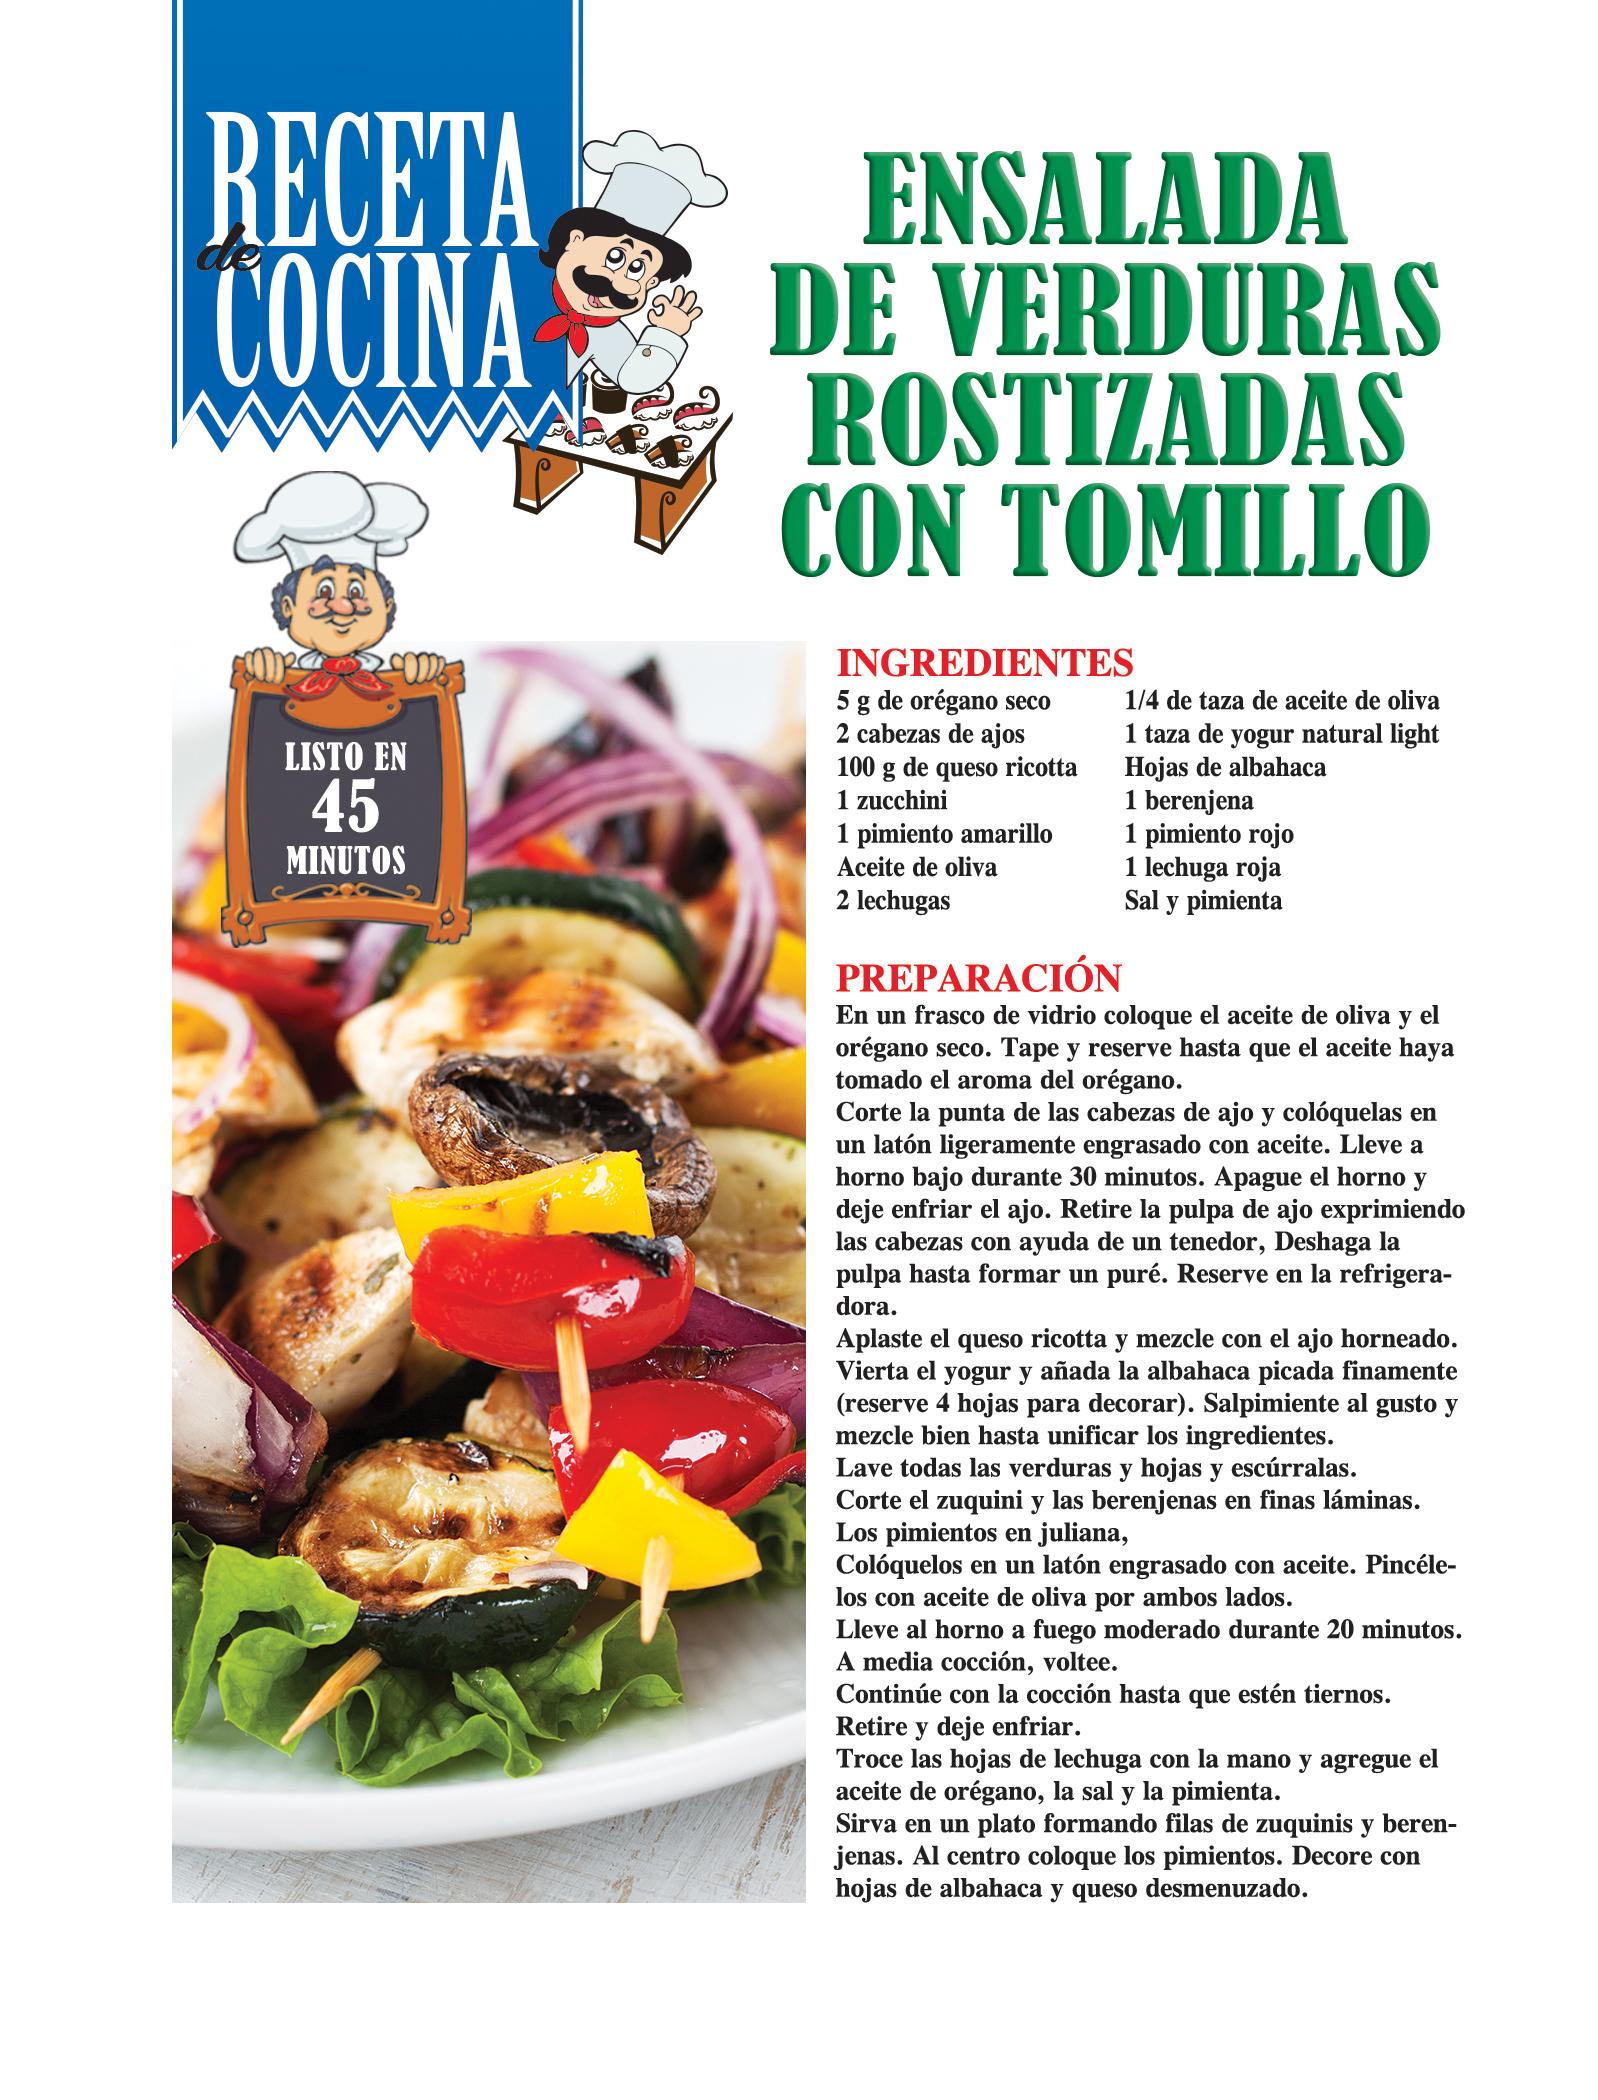 receta cocina - septiembre 2018.jpg